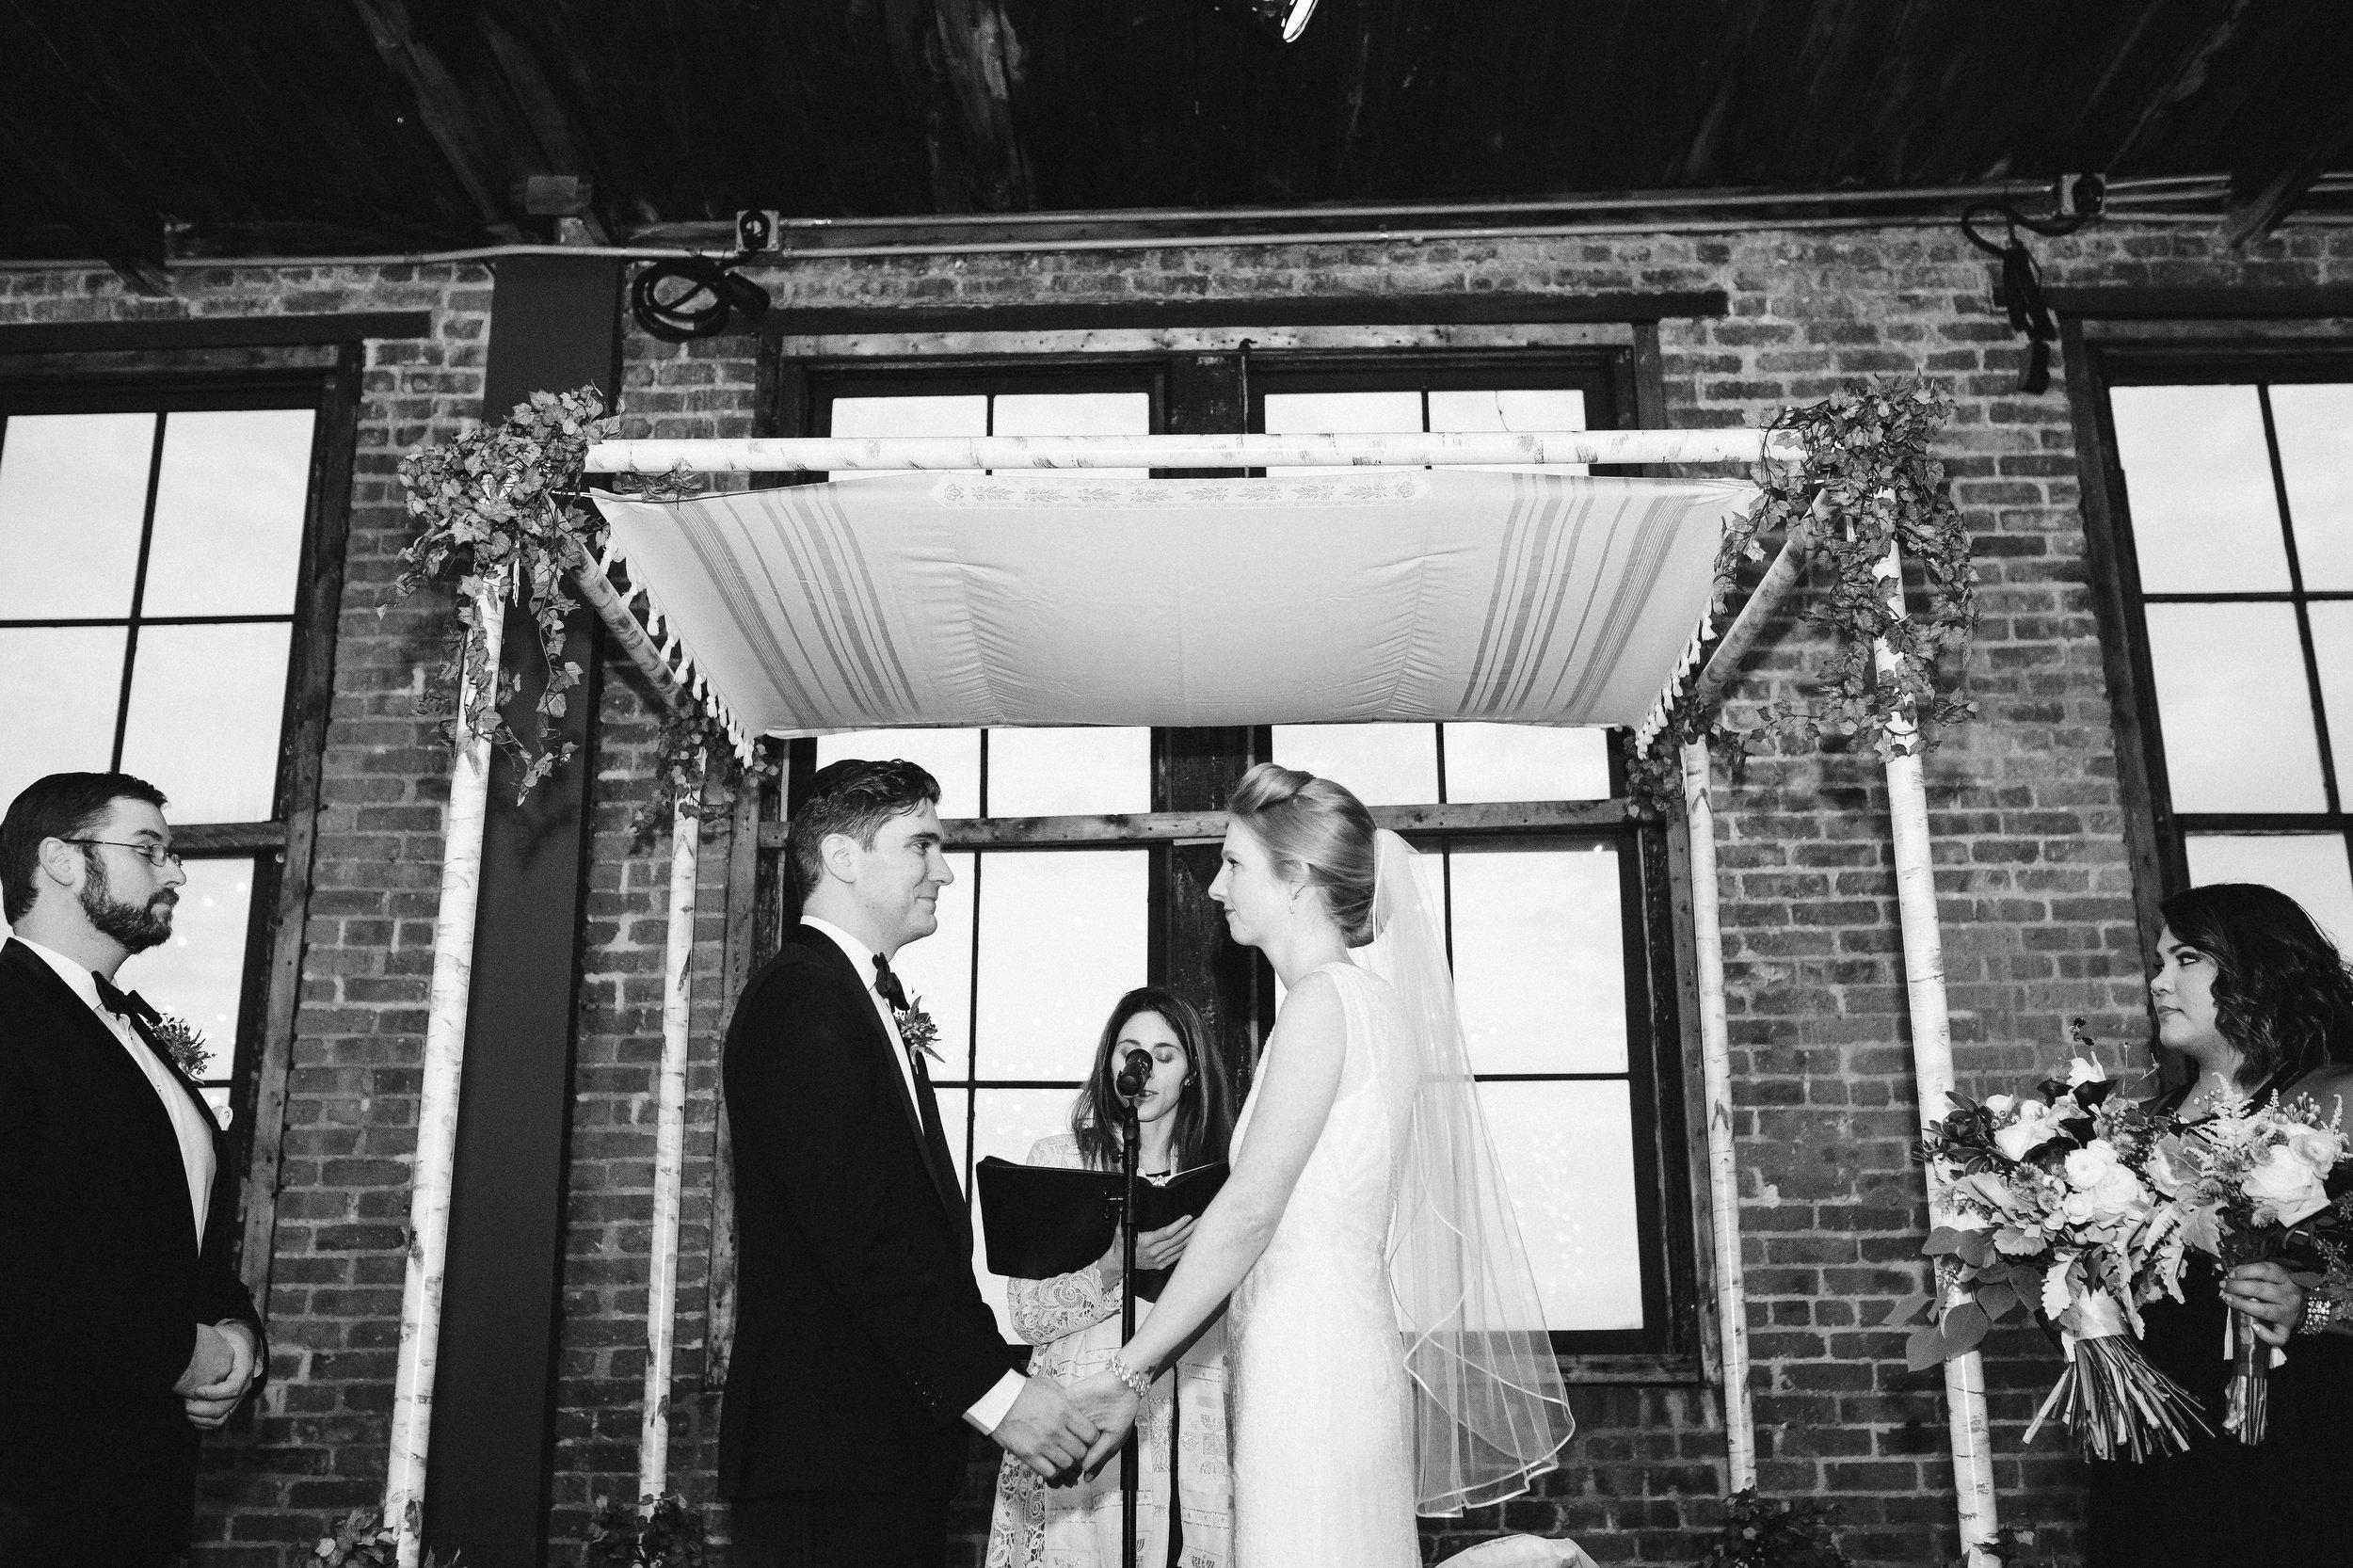 sam-and-jon_metropolitan-building-nyc-wedding-9-6.jpg